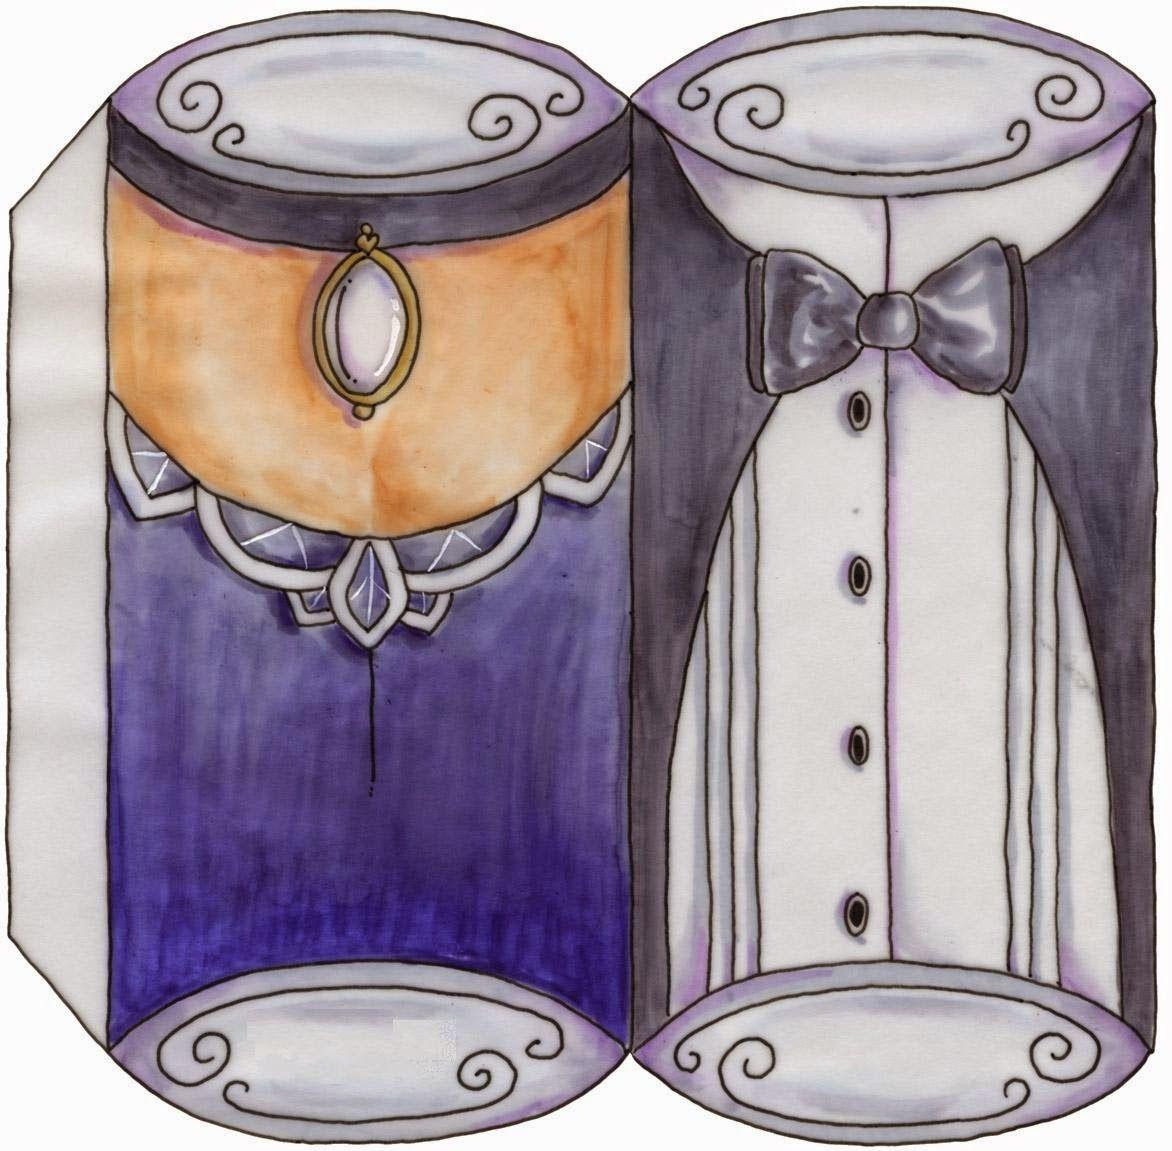 Pareja en Caricatura: Cajas Almohada para Imprimir Gratis. | Oh My Bodas!